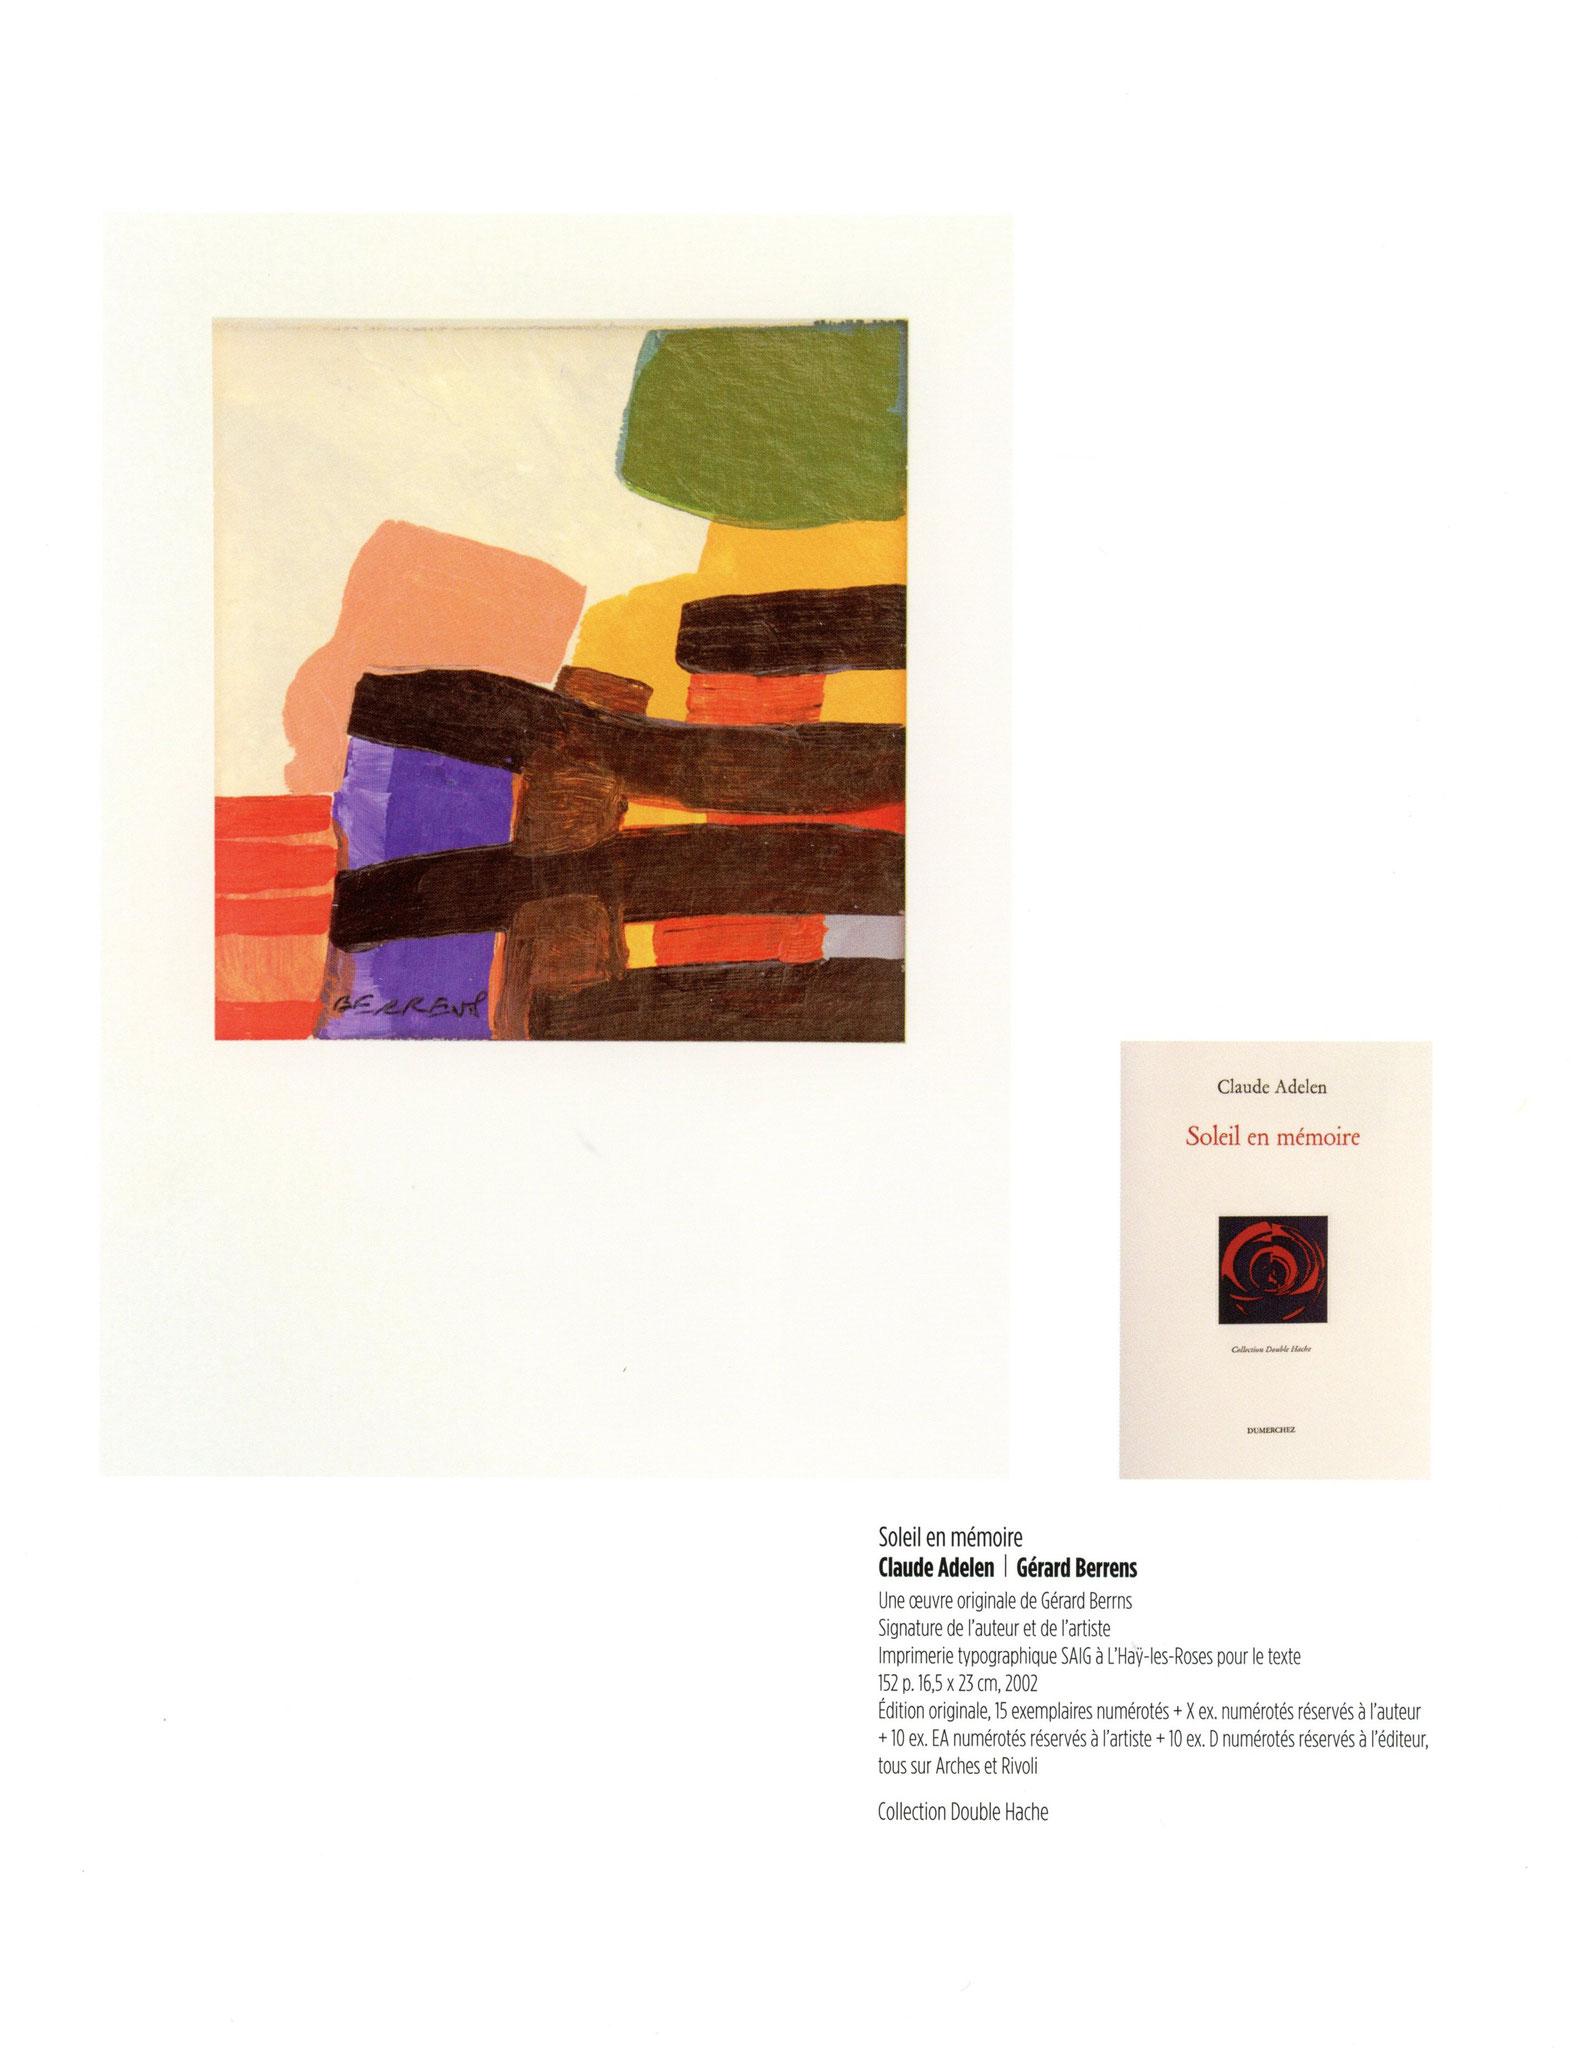 Soleil en mémoire - Claude Adelen / Gérard Berrens